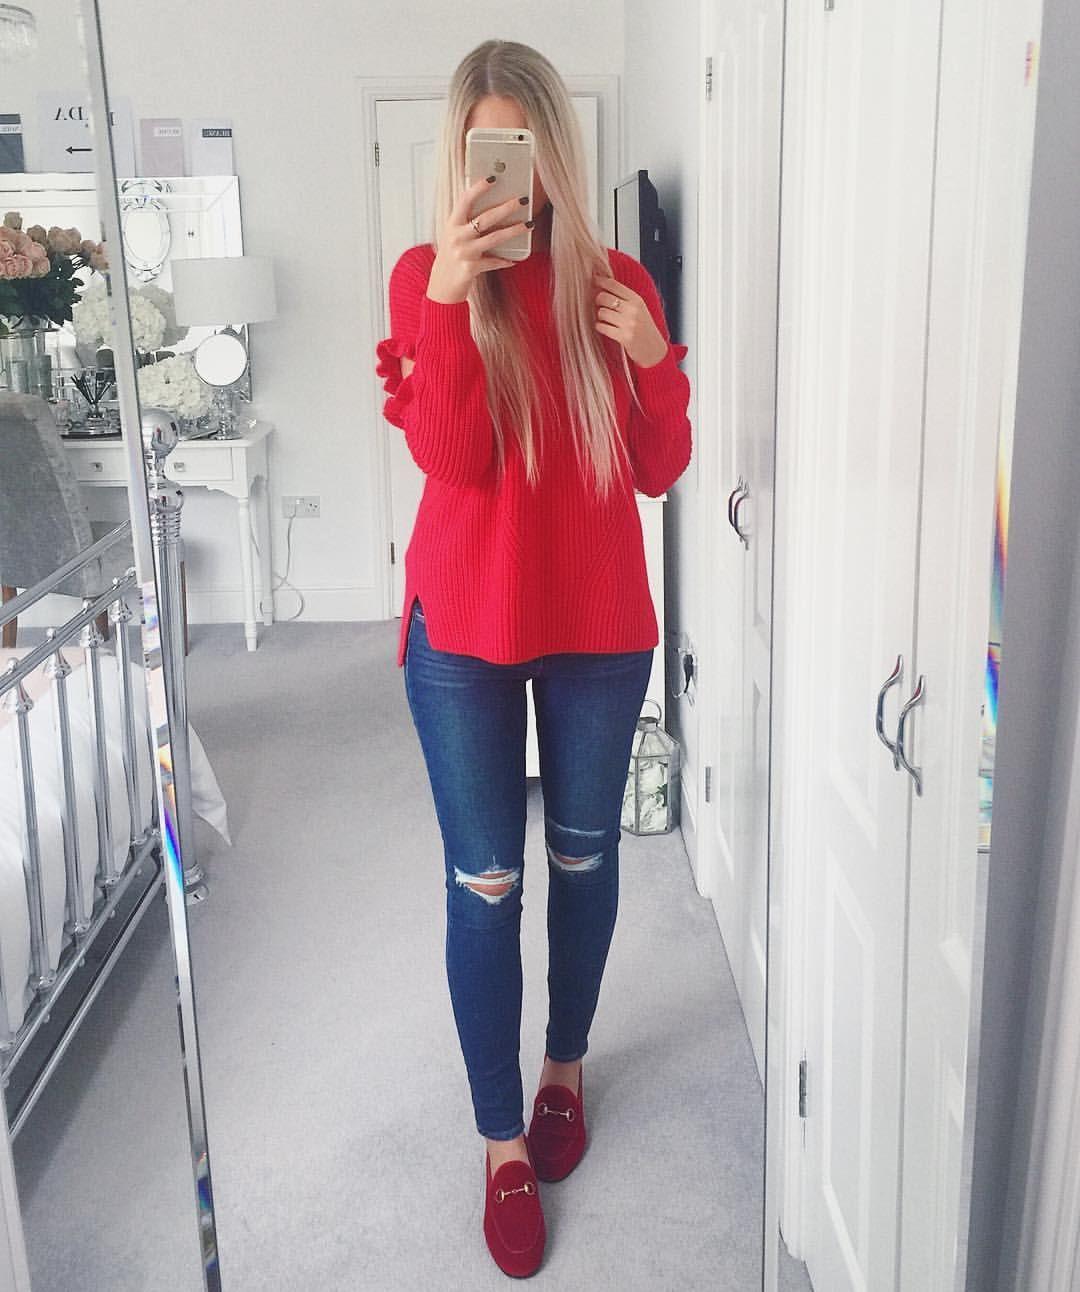 4d1747667 Instagram @emilyjanehardy Miss Selfridge red knitted jumper, paige denim  jeans, red velvet Gucci Jordaan loafers